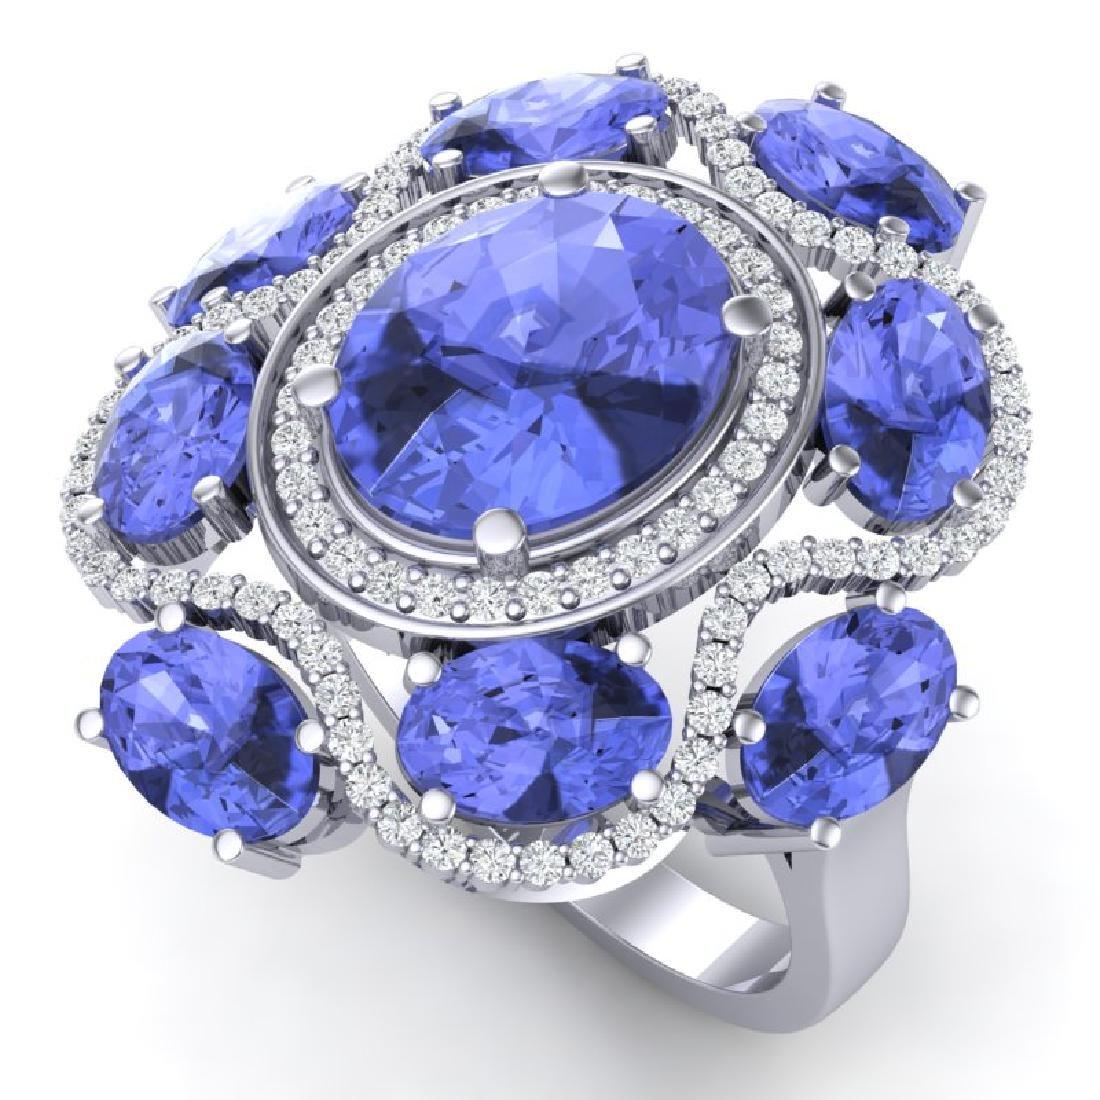 9.67 CTW Royalty Tanzanite & VS Diamond Ring 18K White